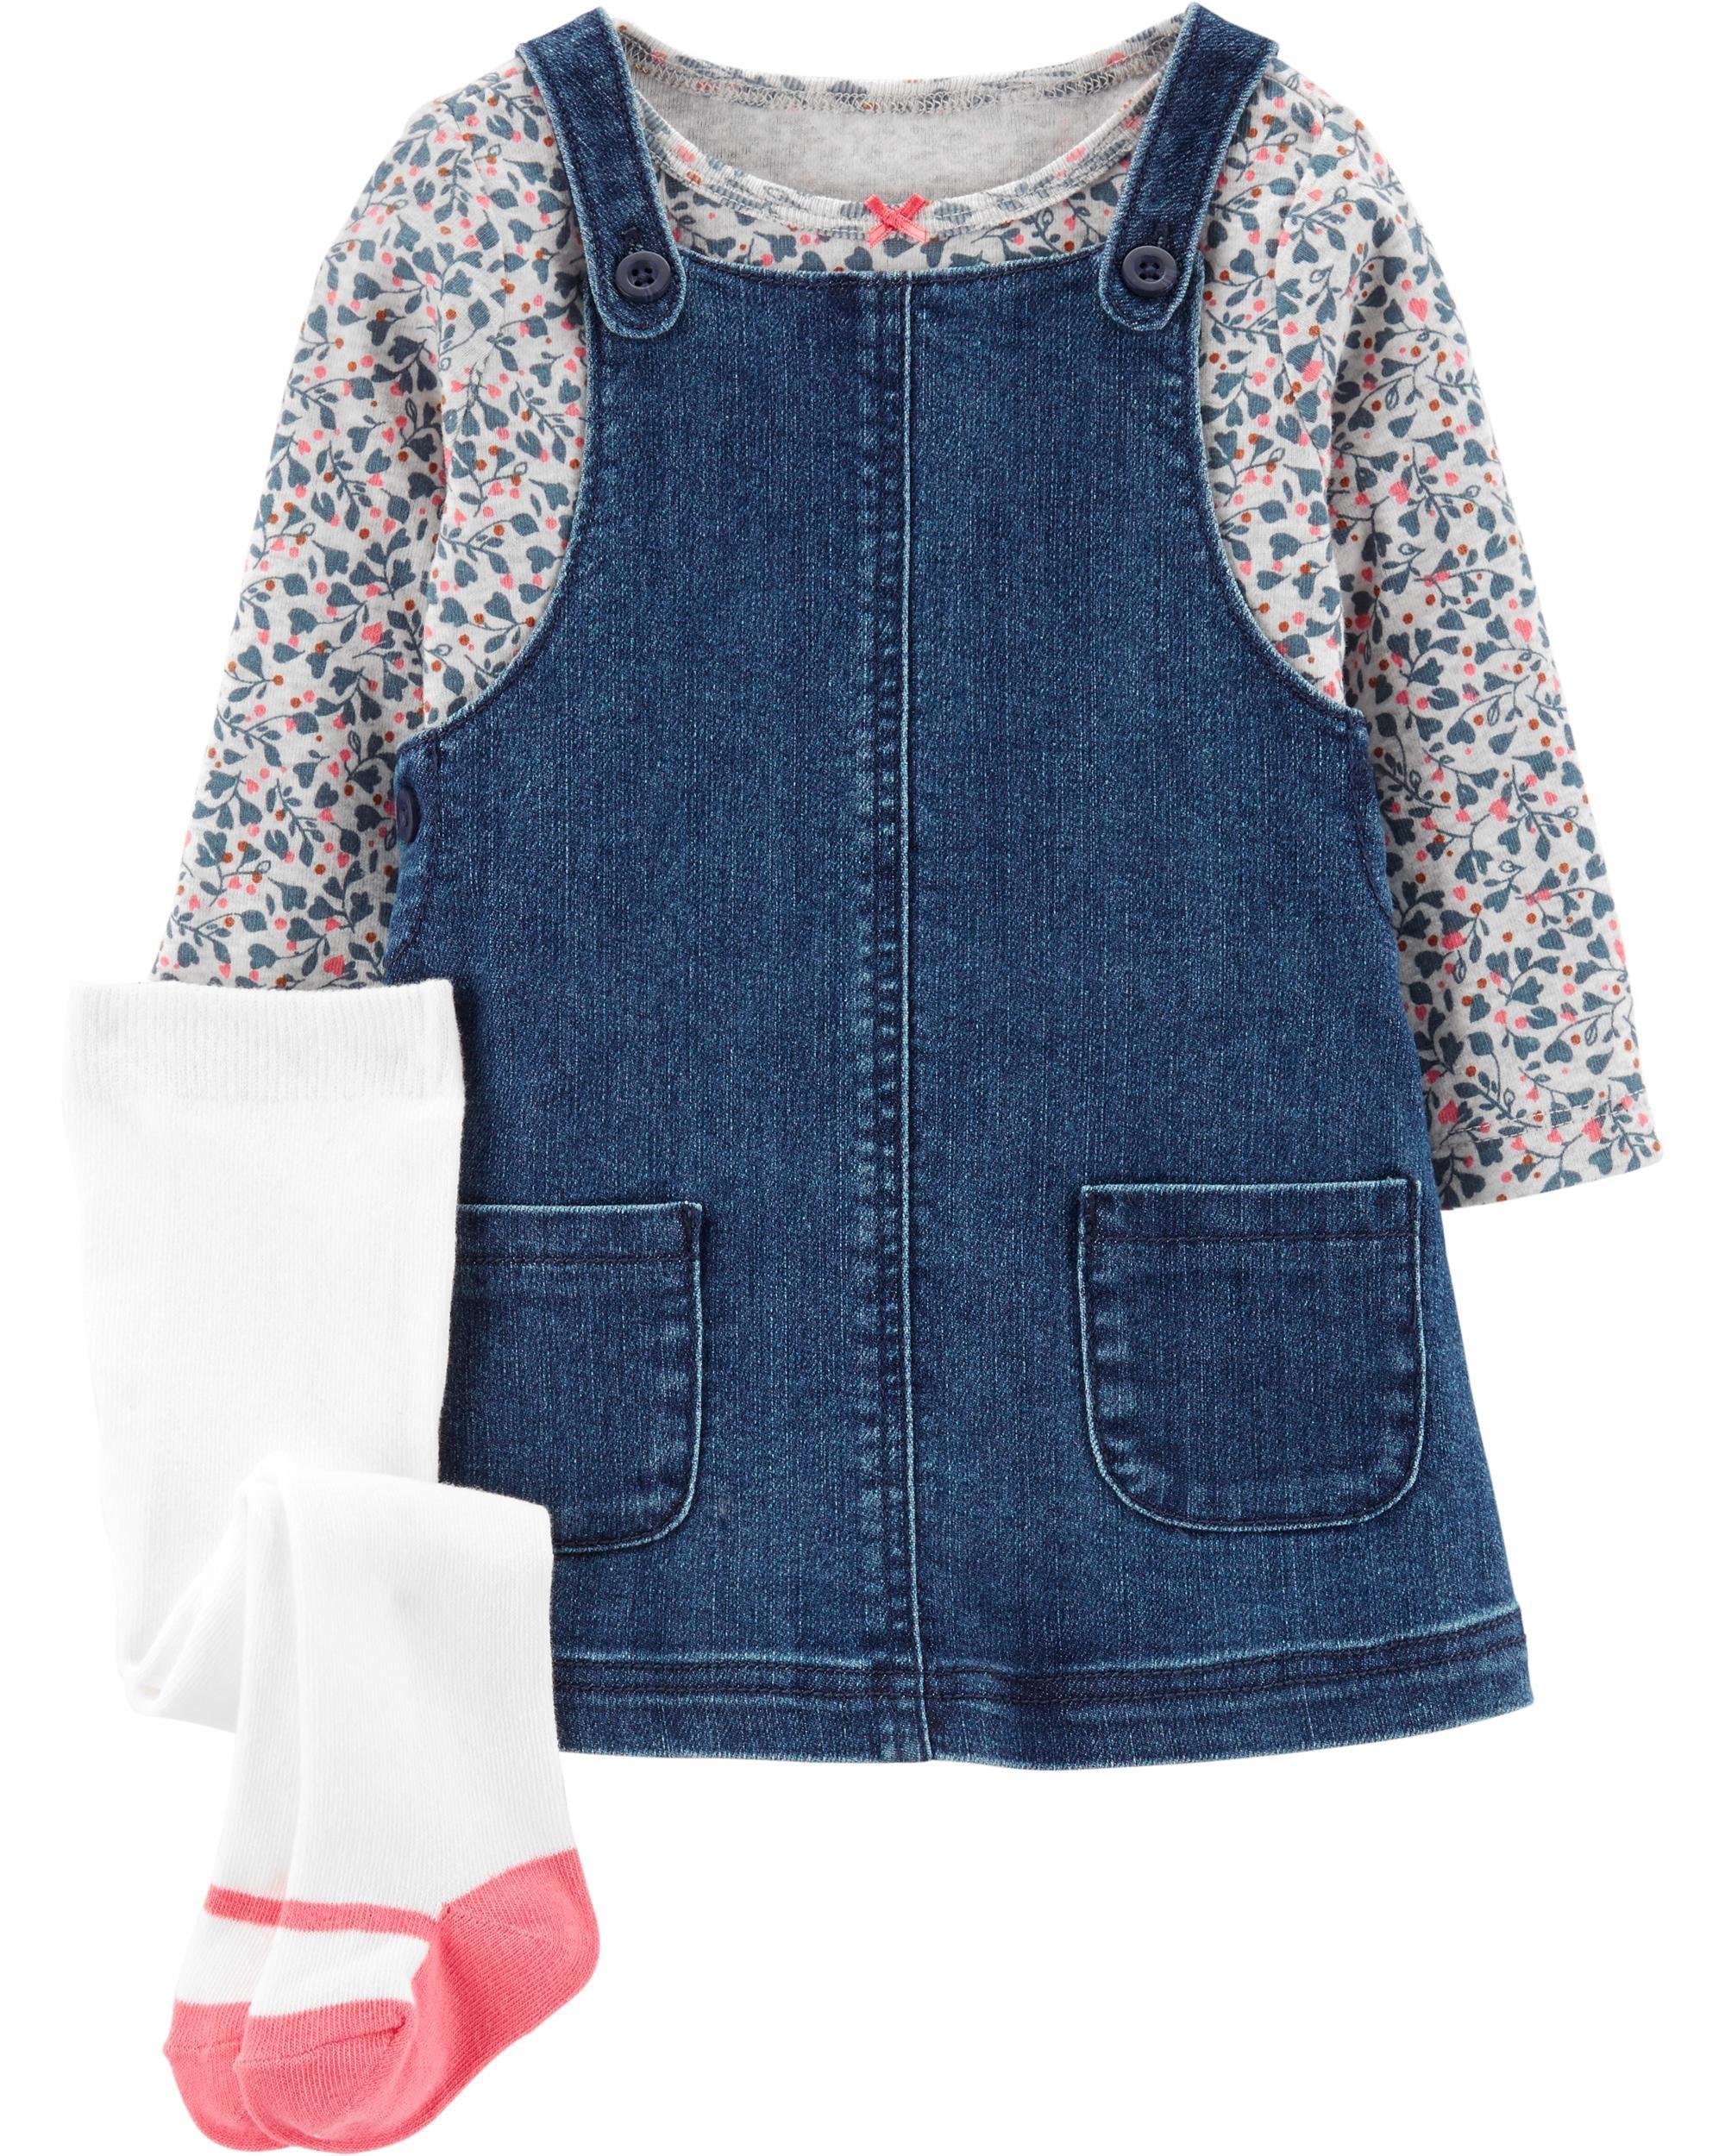 17++ Baby denim jumper dress ideas